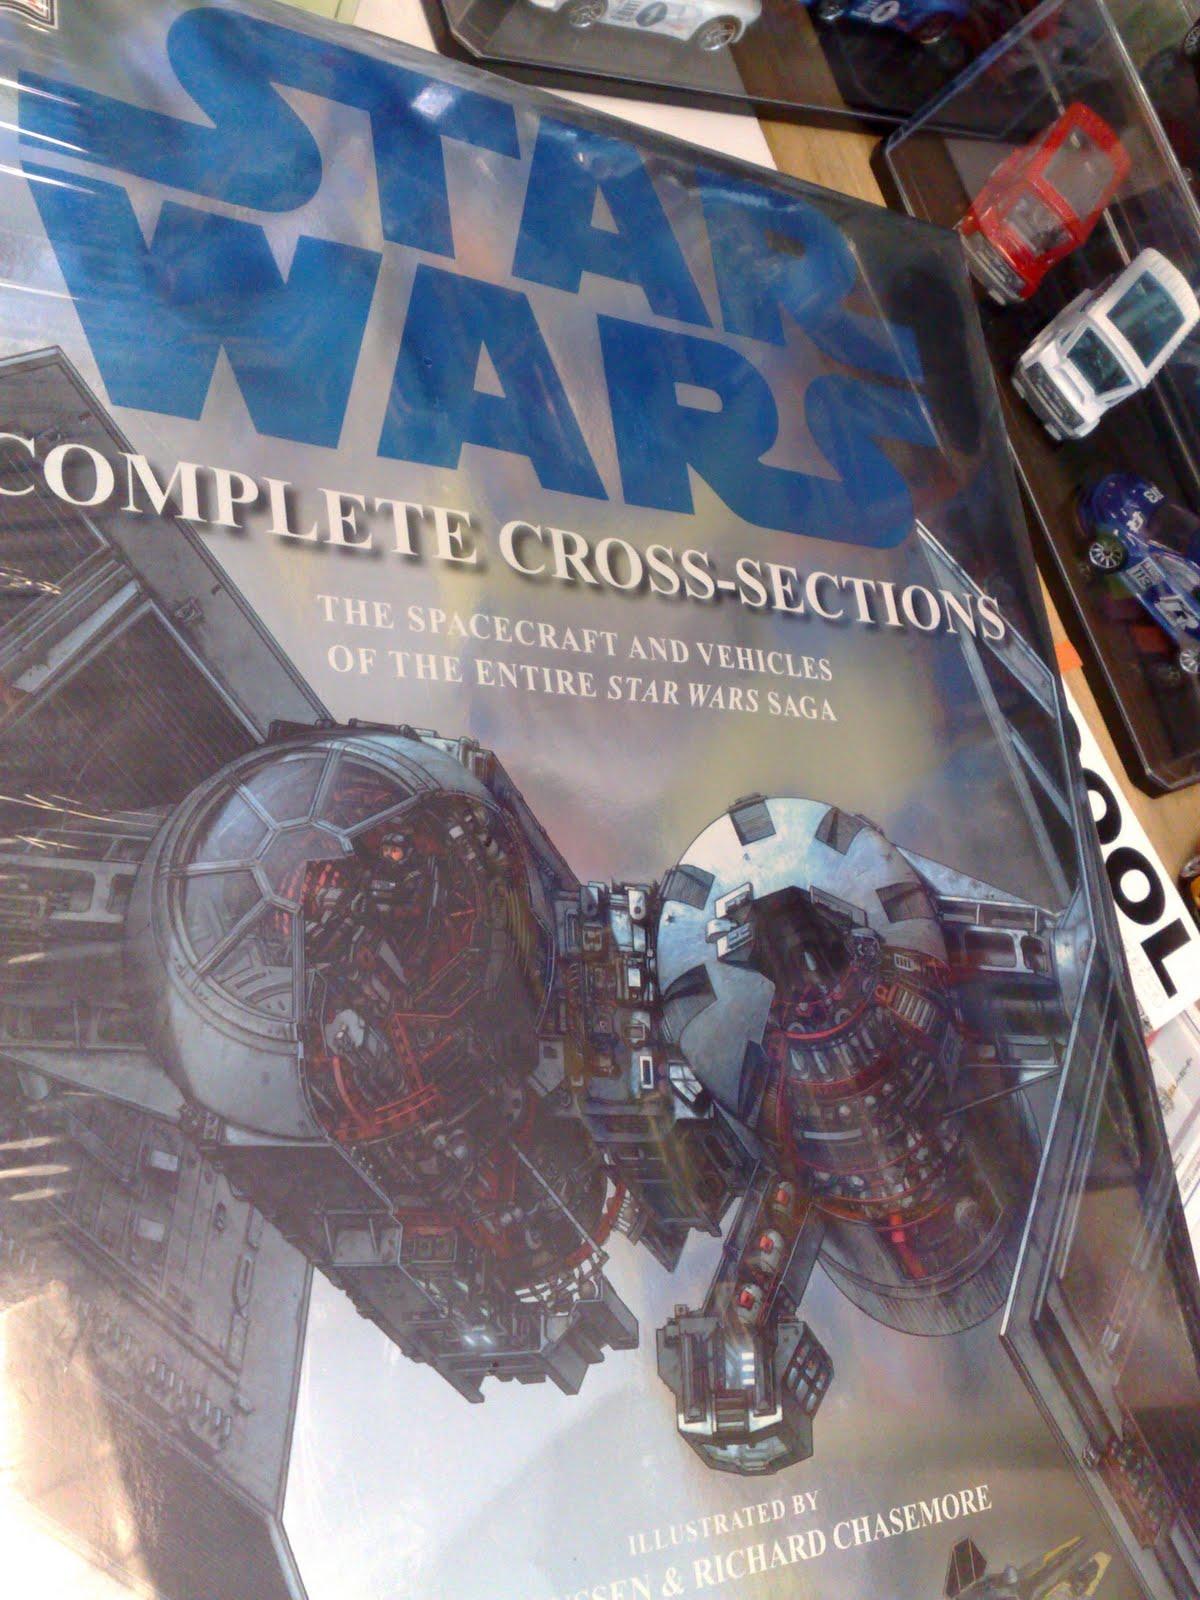 D.A.Y.D.R.E.A.M.E.R: Star Wars - Complete Cross Section.